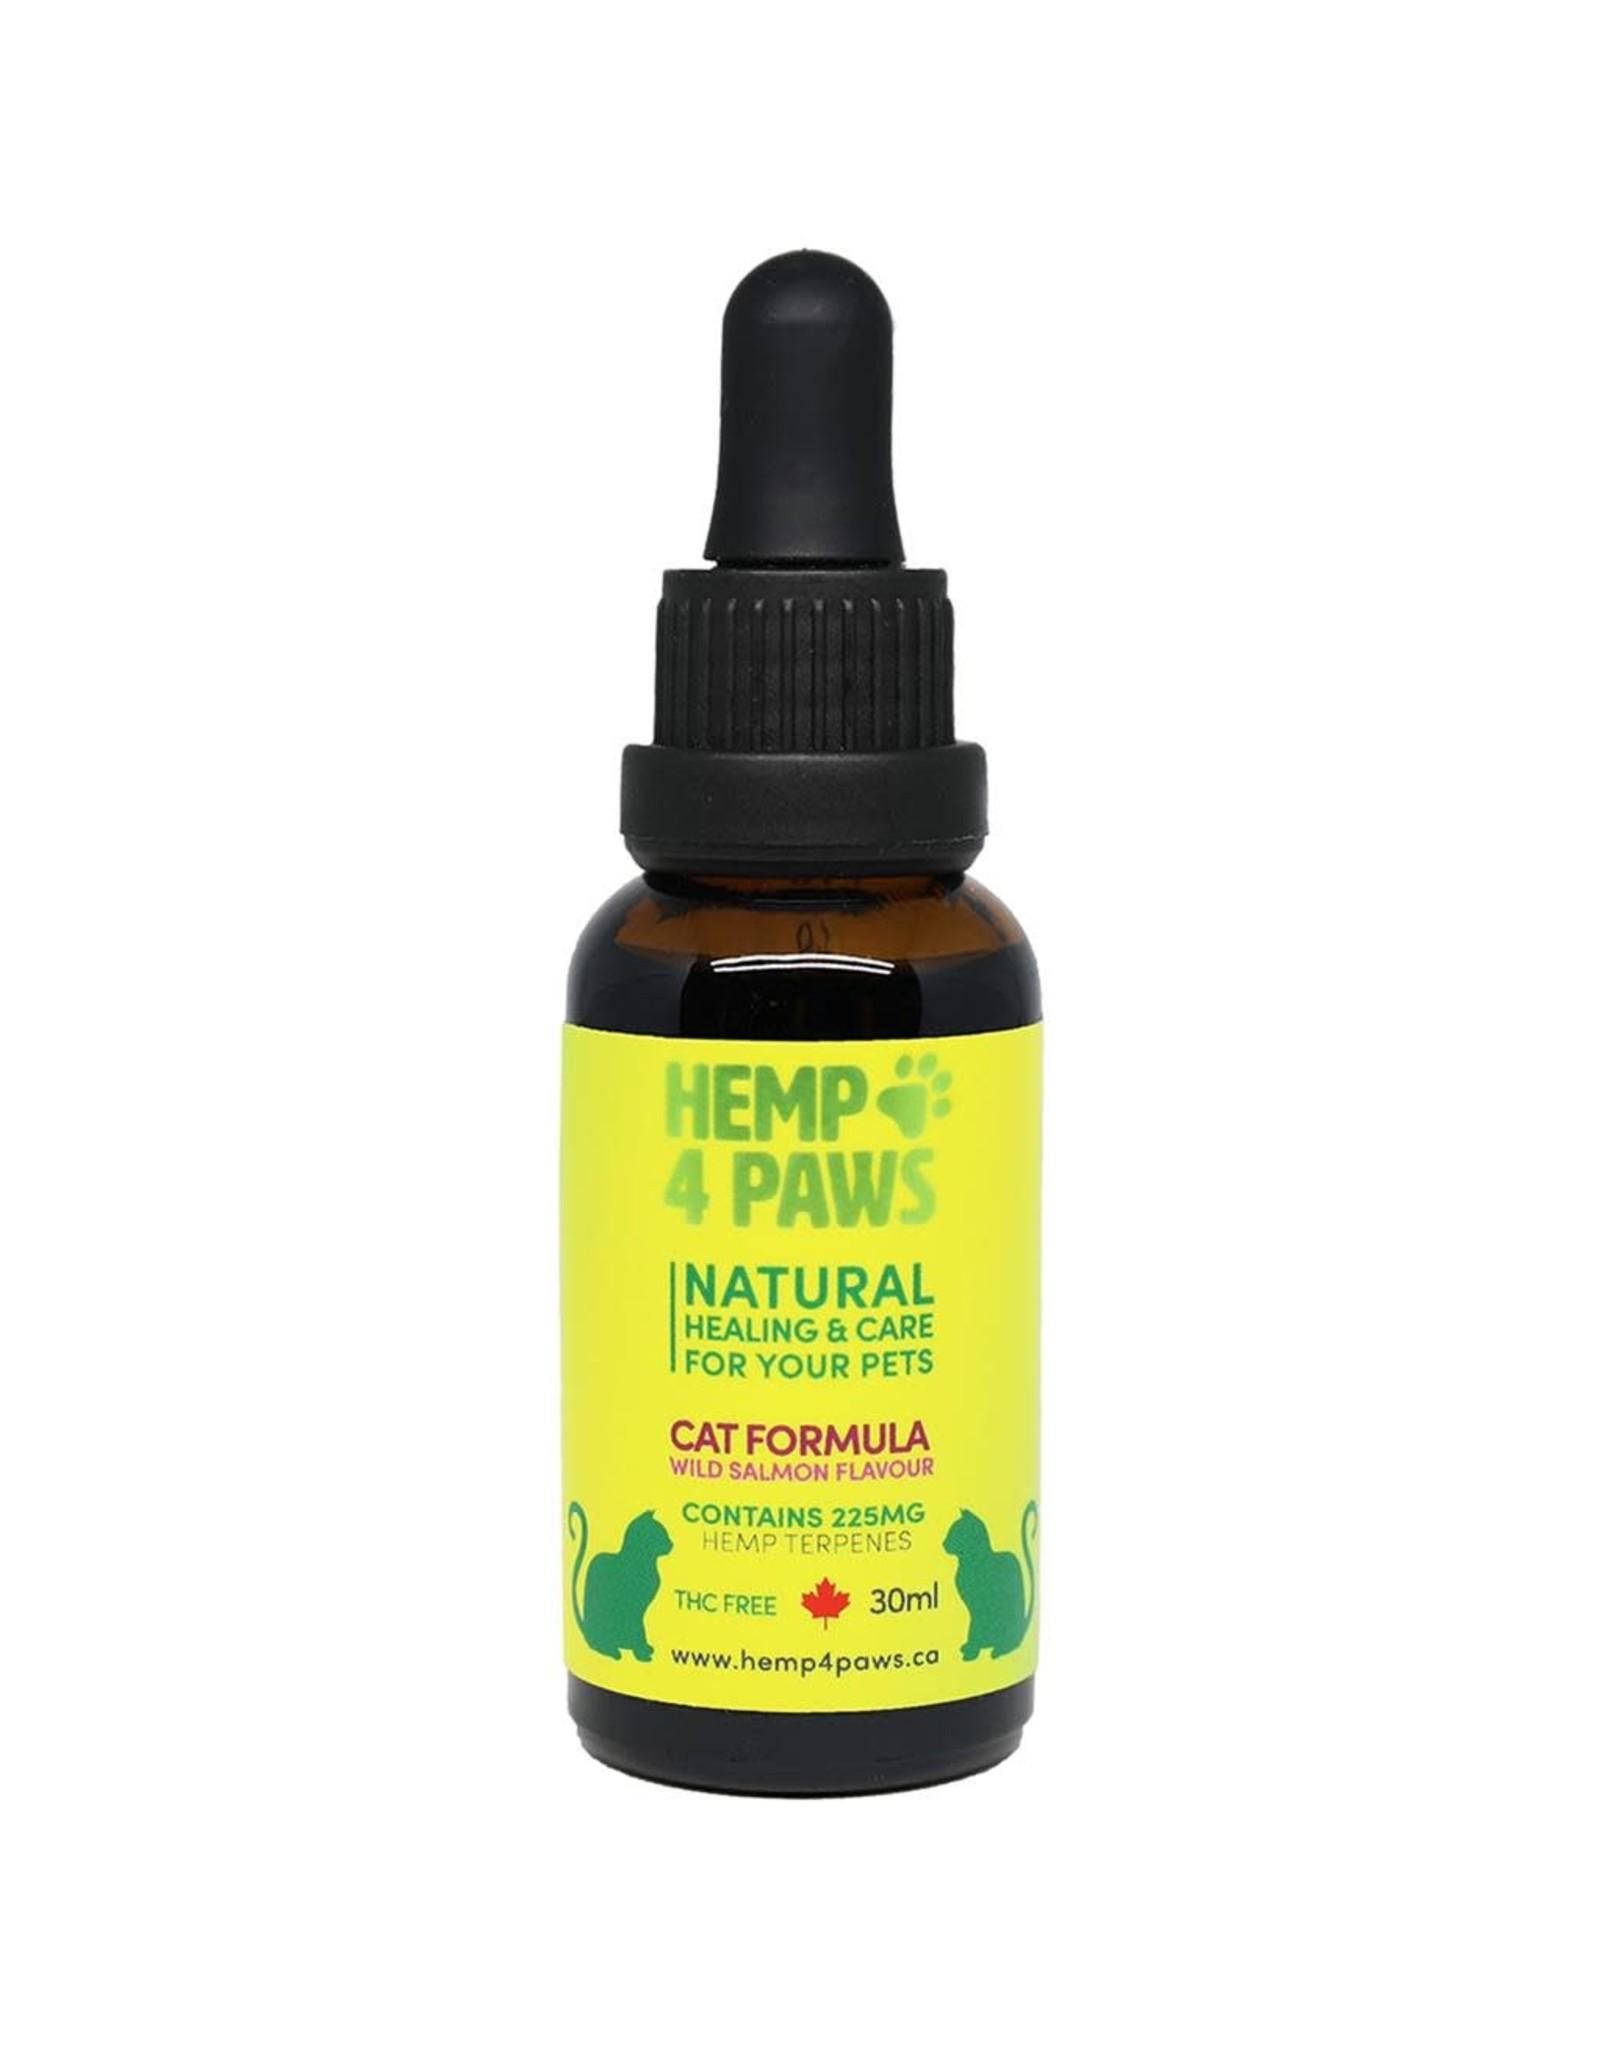 Hemp 4 Paws Hemp Seed Oil Wild Salmon Flavour 225MG/30ML [CAT]